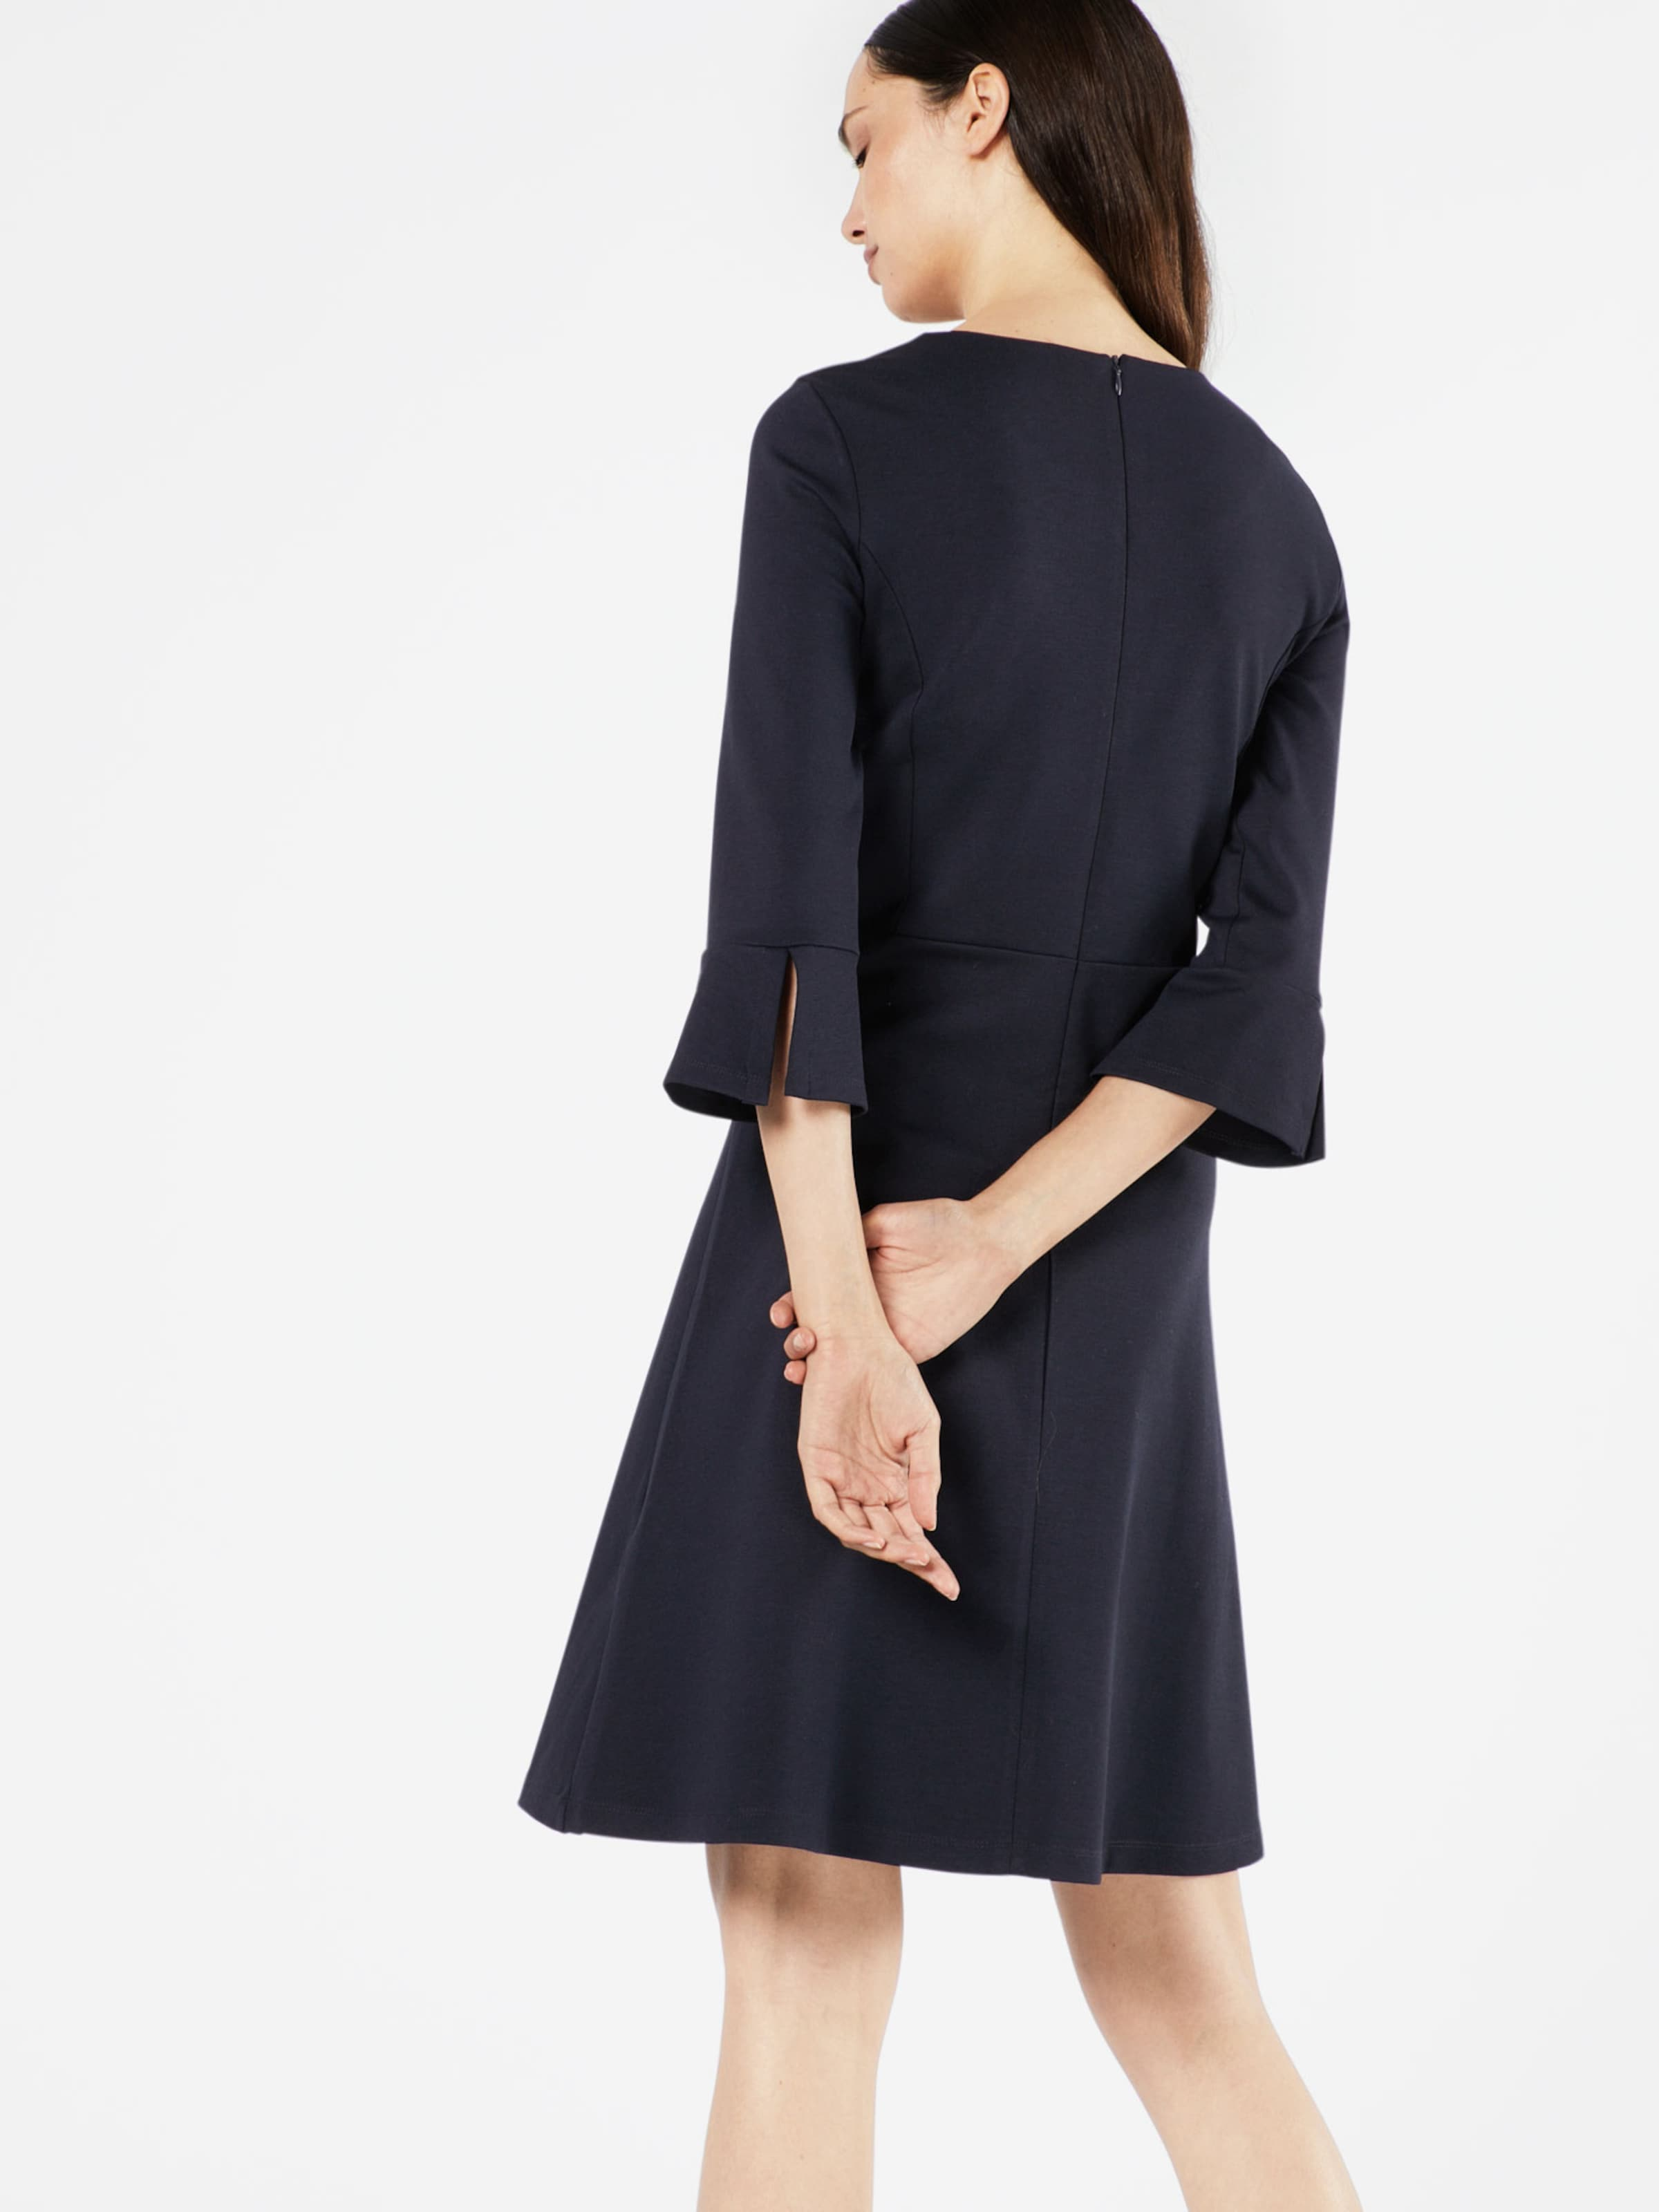 MORE & MORE Kleid 'Wirk' Original-Verkauf Online CMTi3CPyy